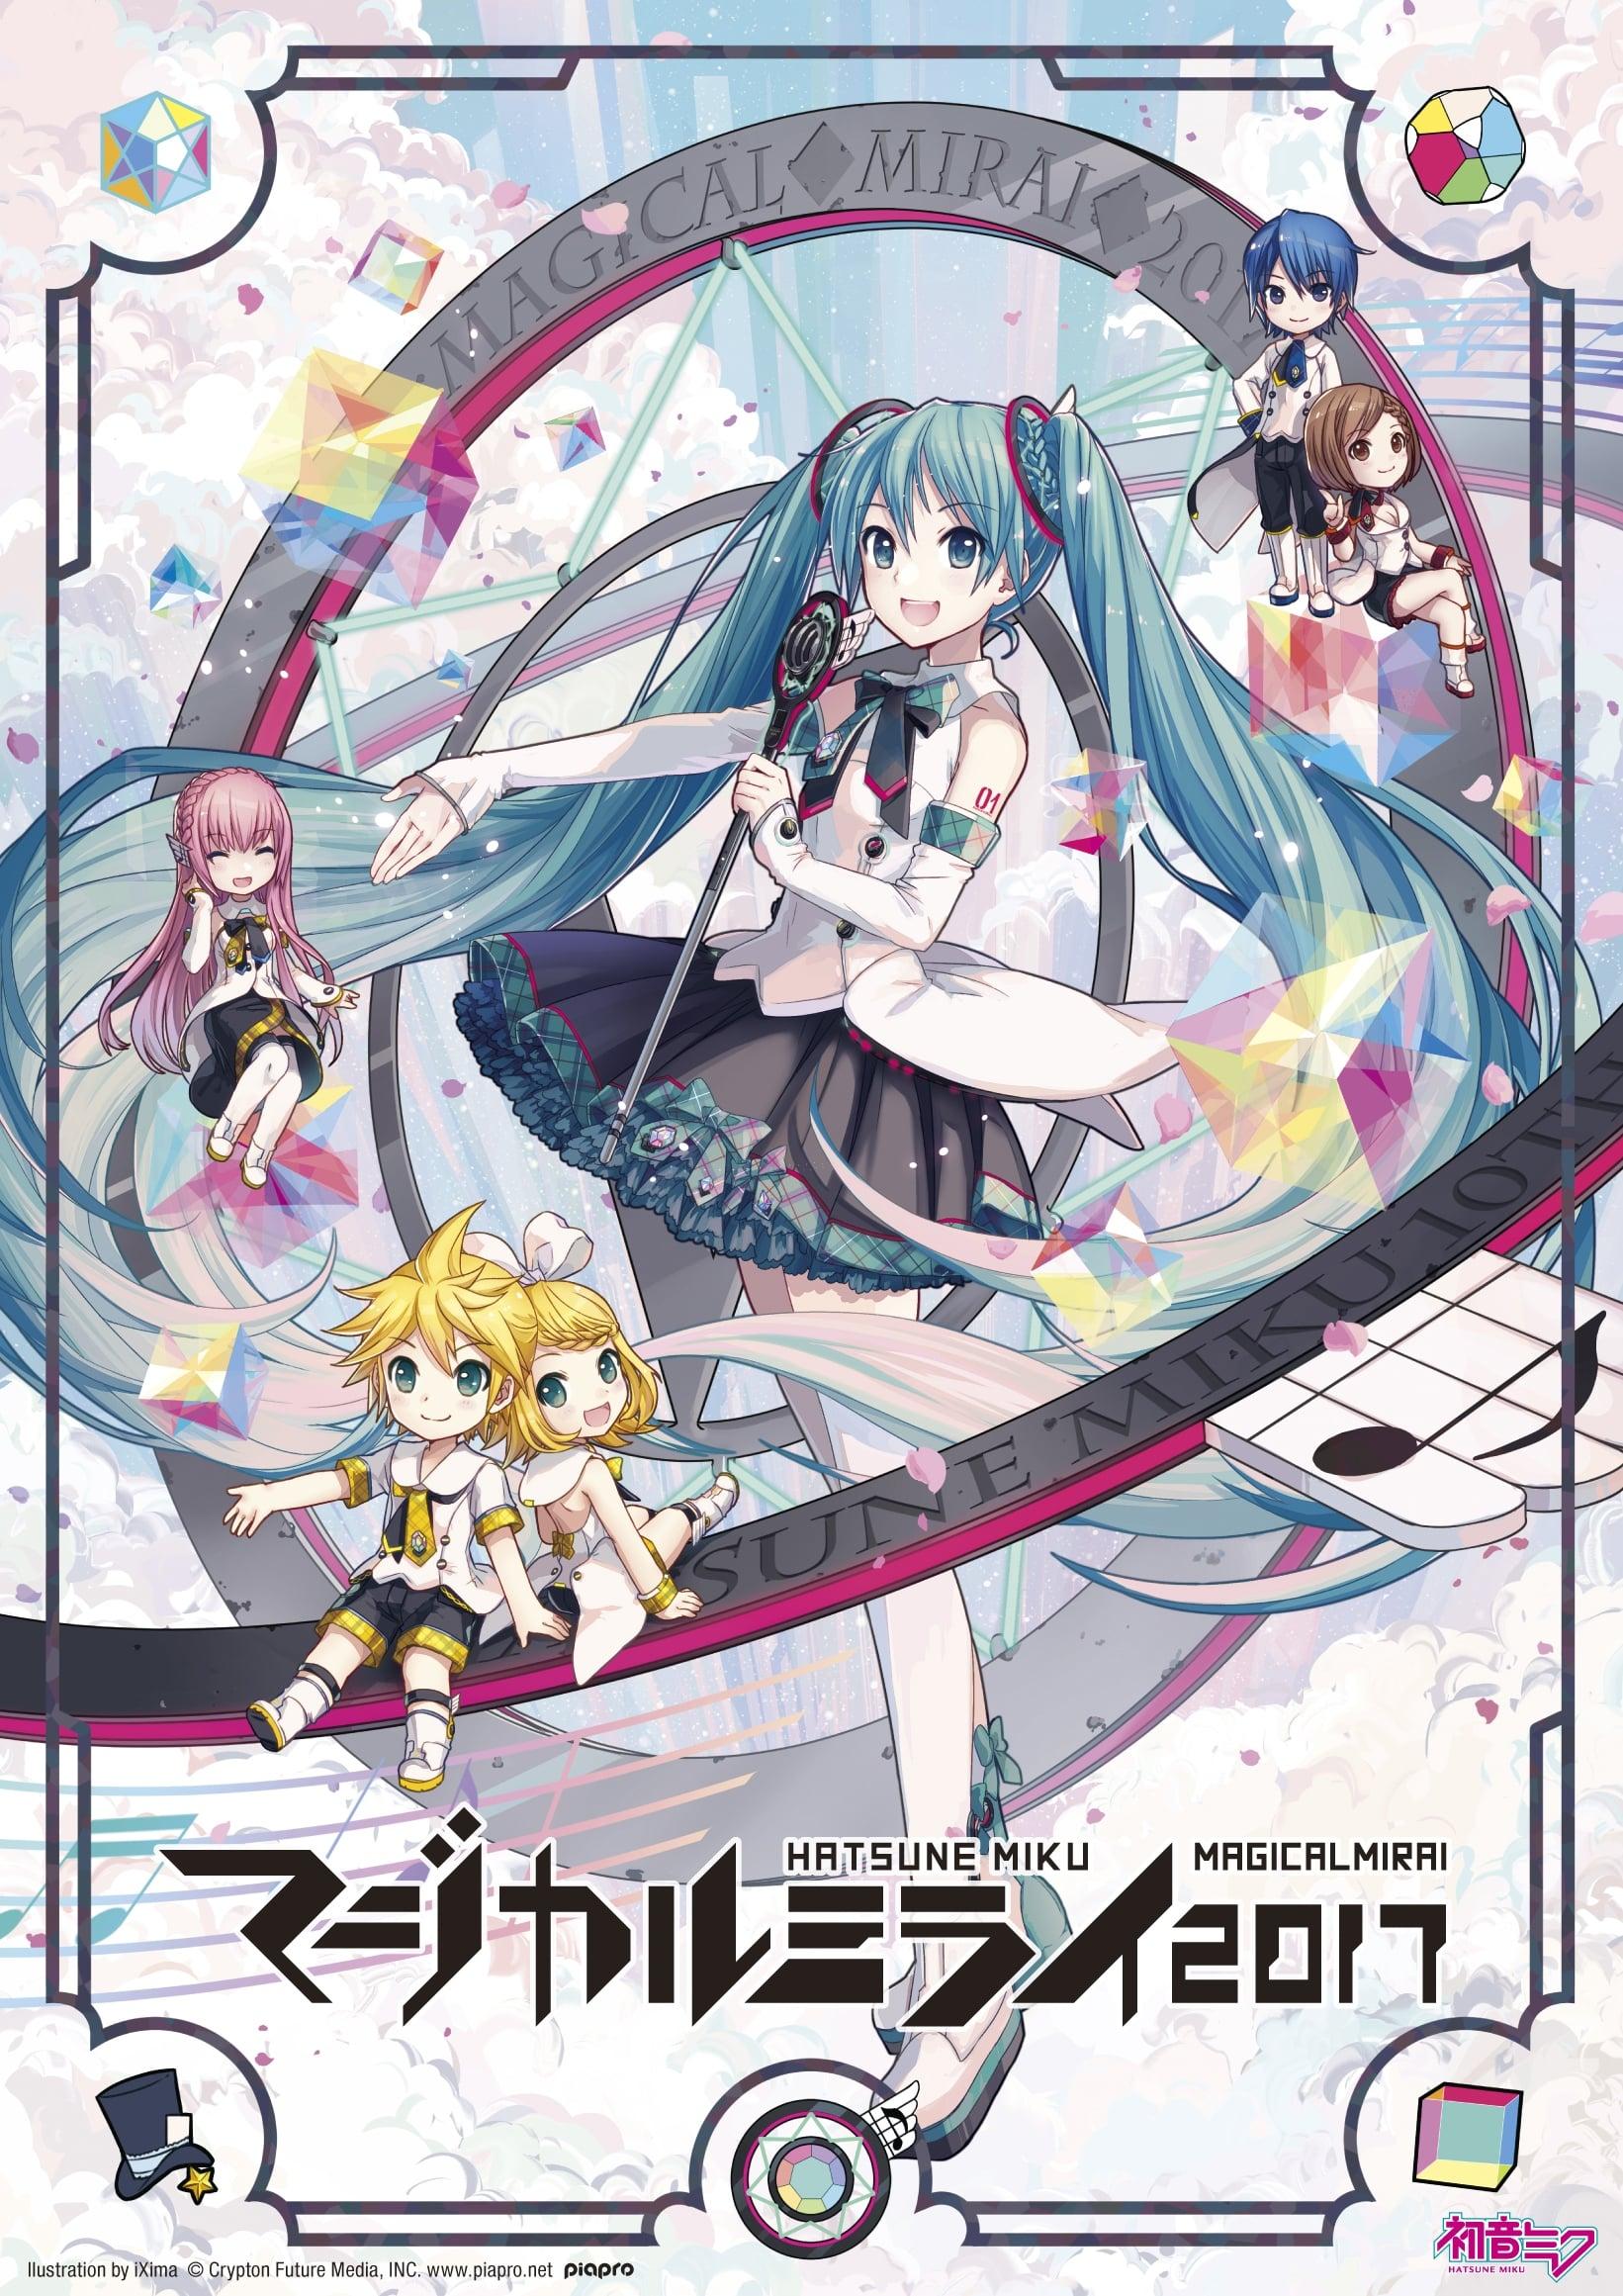 Hatsune Miku: Magical Mirai 2017 Daily Songs (2018)